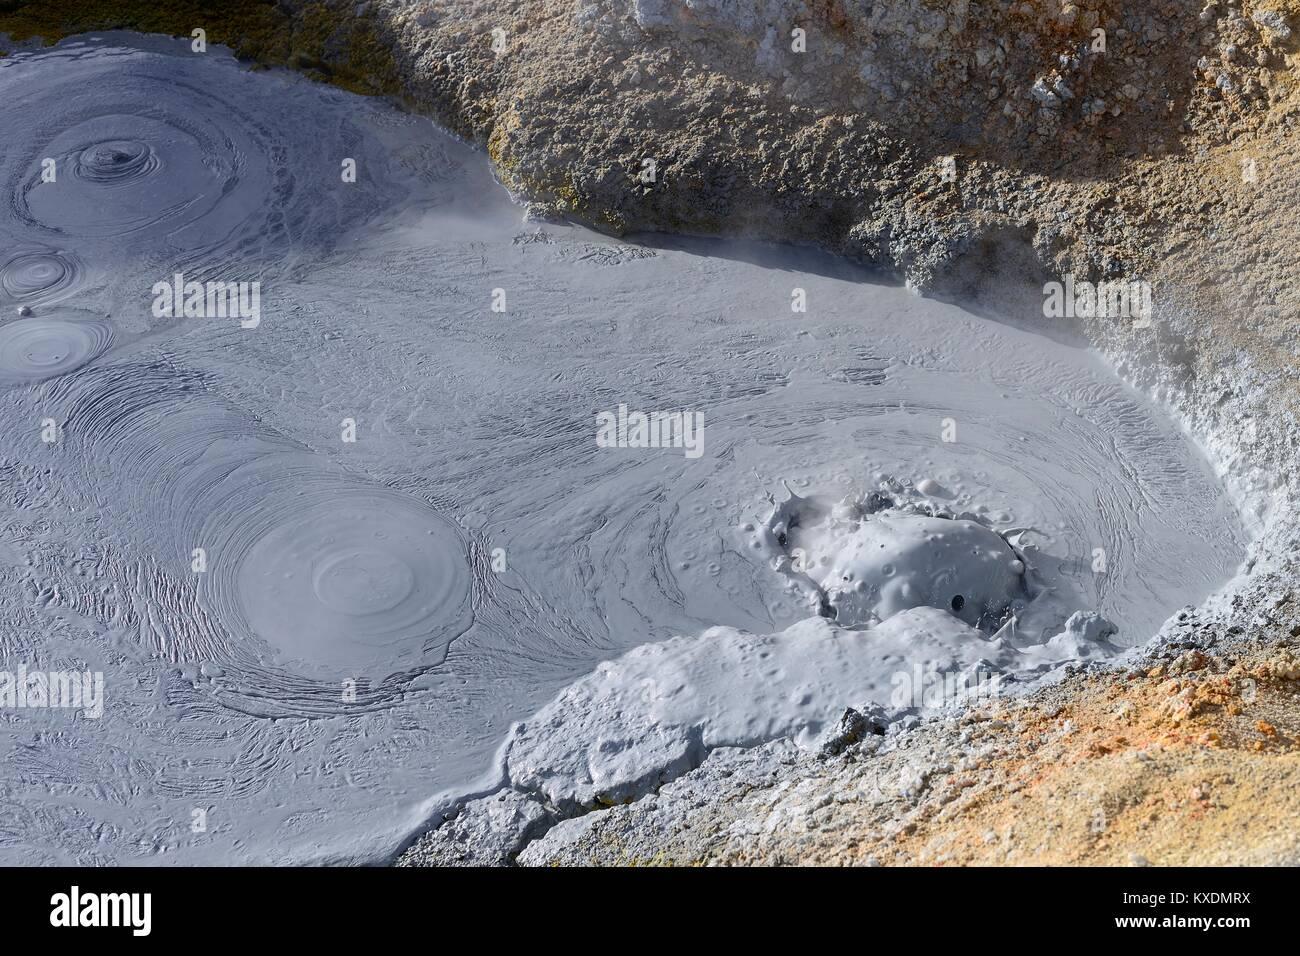 Boiling mud hole at the highest geothermal field in the world, Sol de Mañana, Reserva Nacional de Fauna Andina - Stock Image